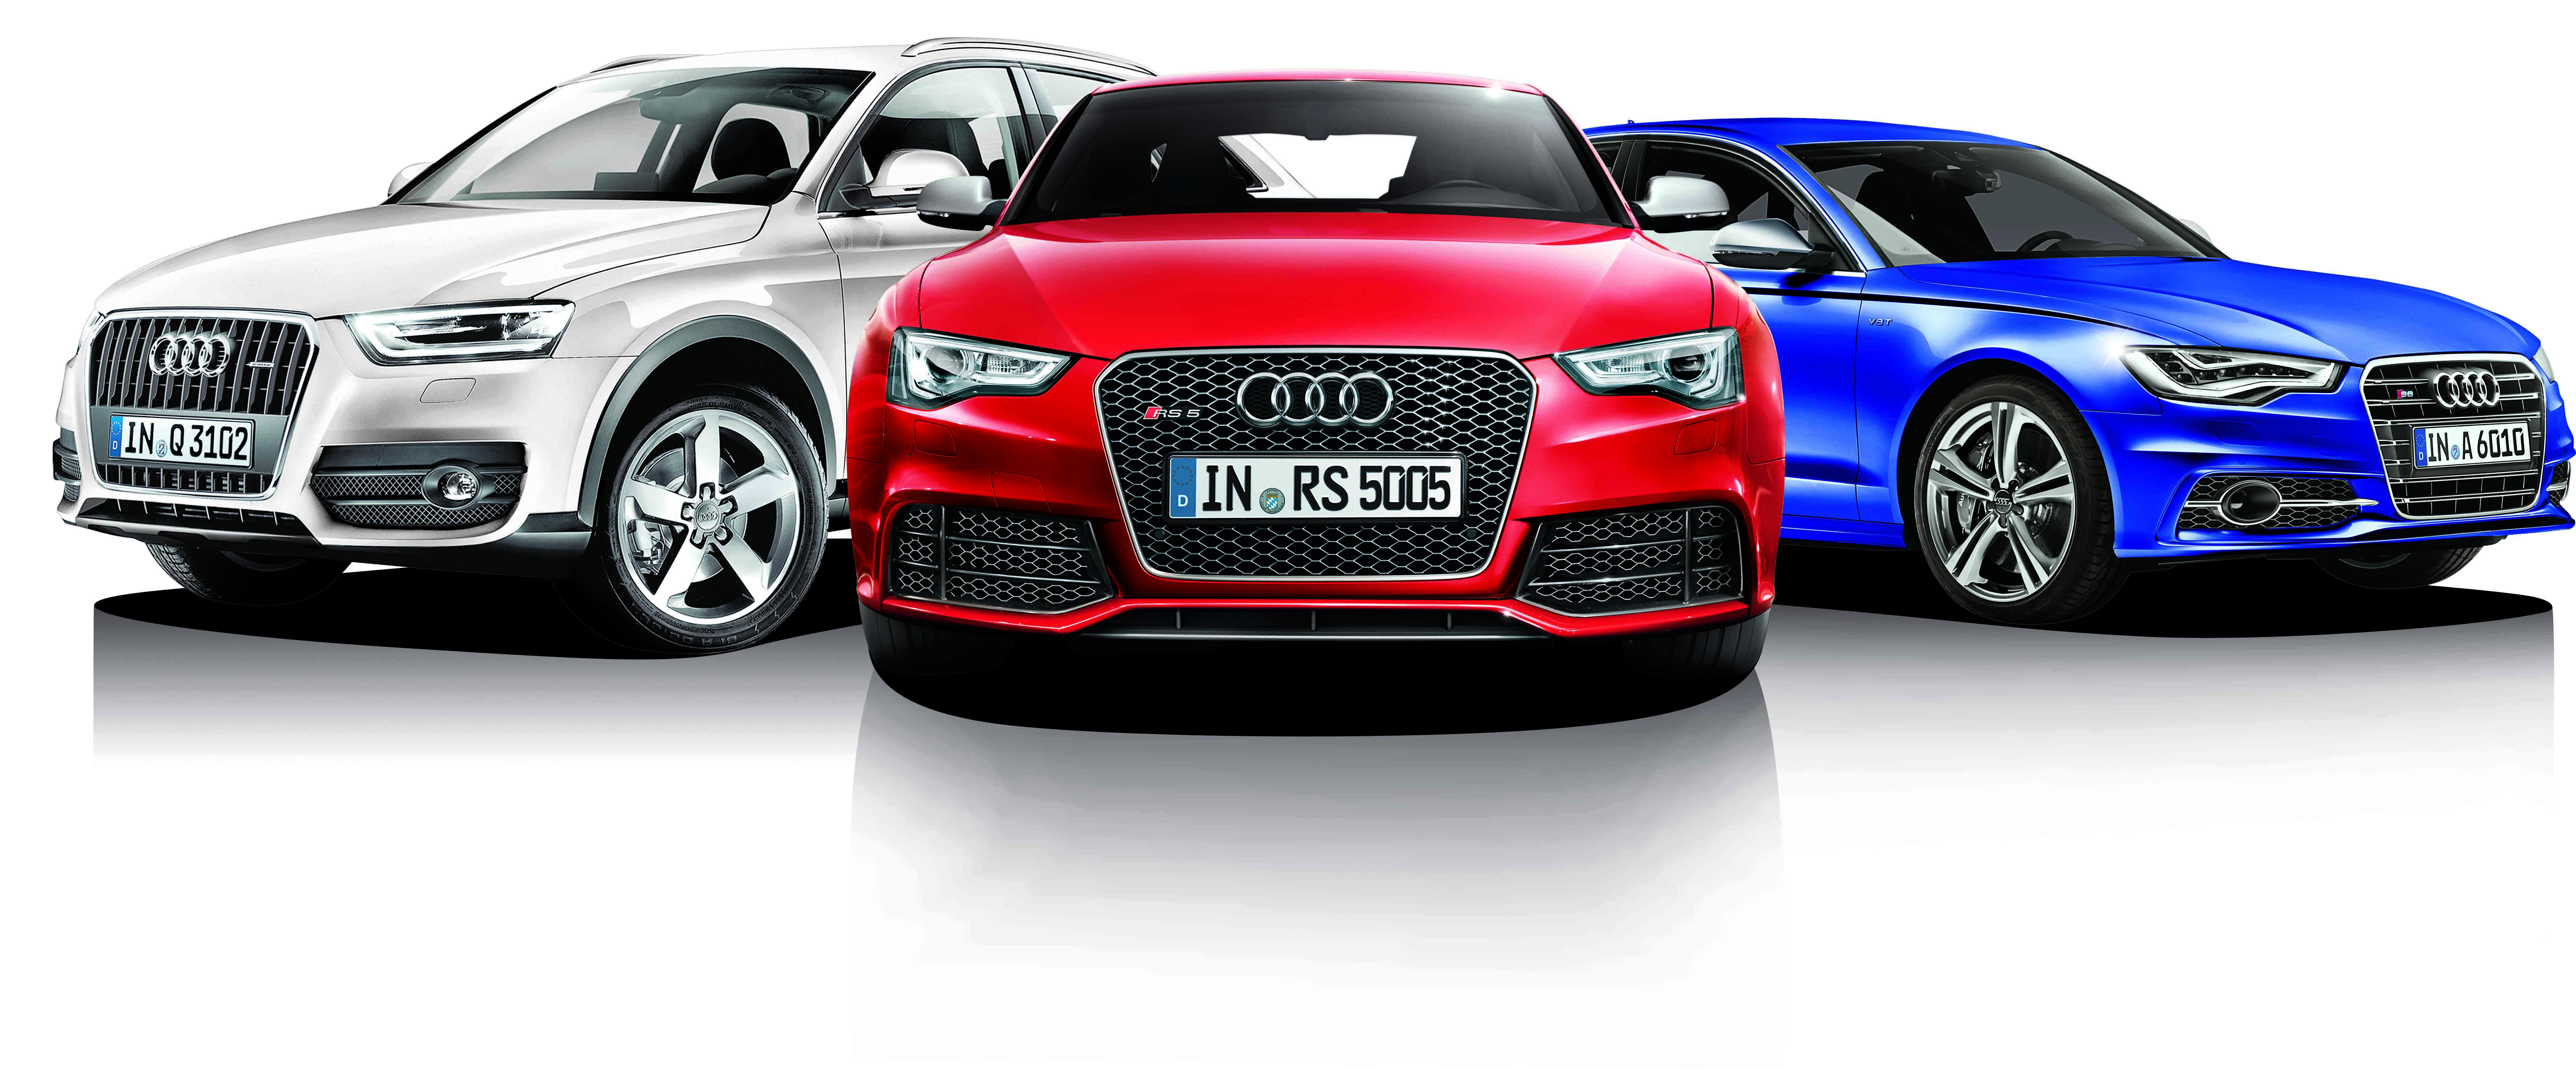 Three Audi Car In Different Colors - Audi car colors